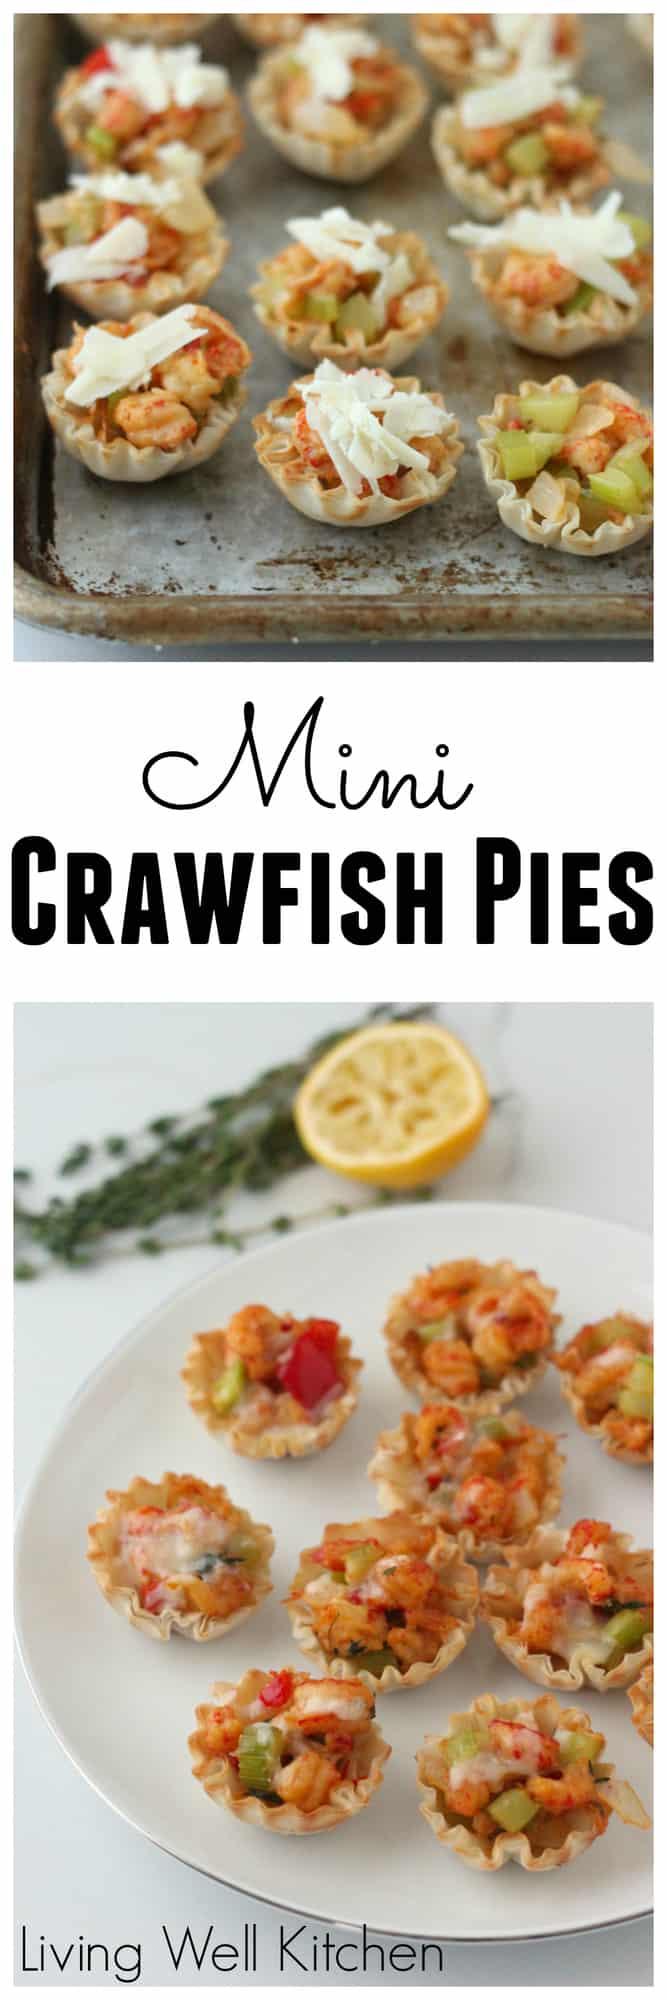 Revamped Mini Crawfish Pies from @memeinge are adorable bites of cajun deliciousness